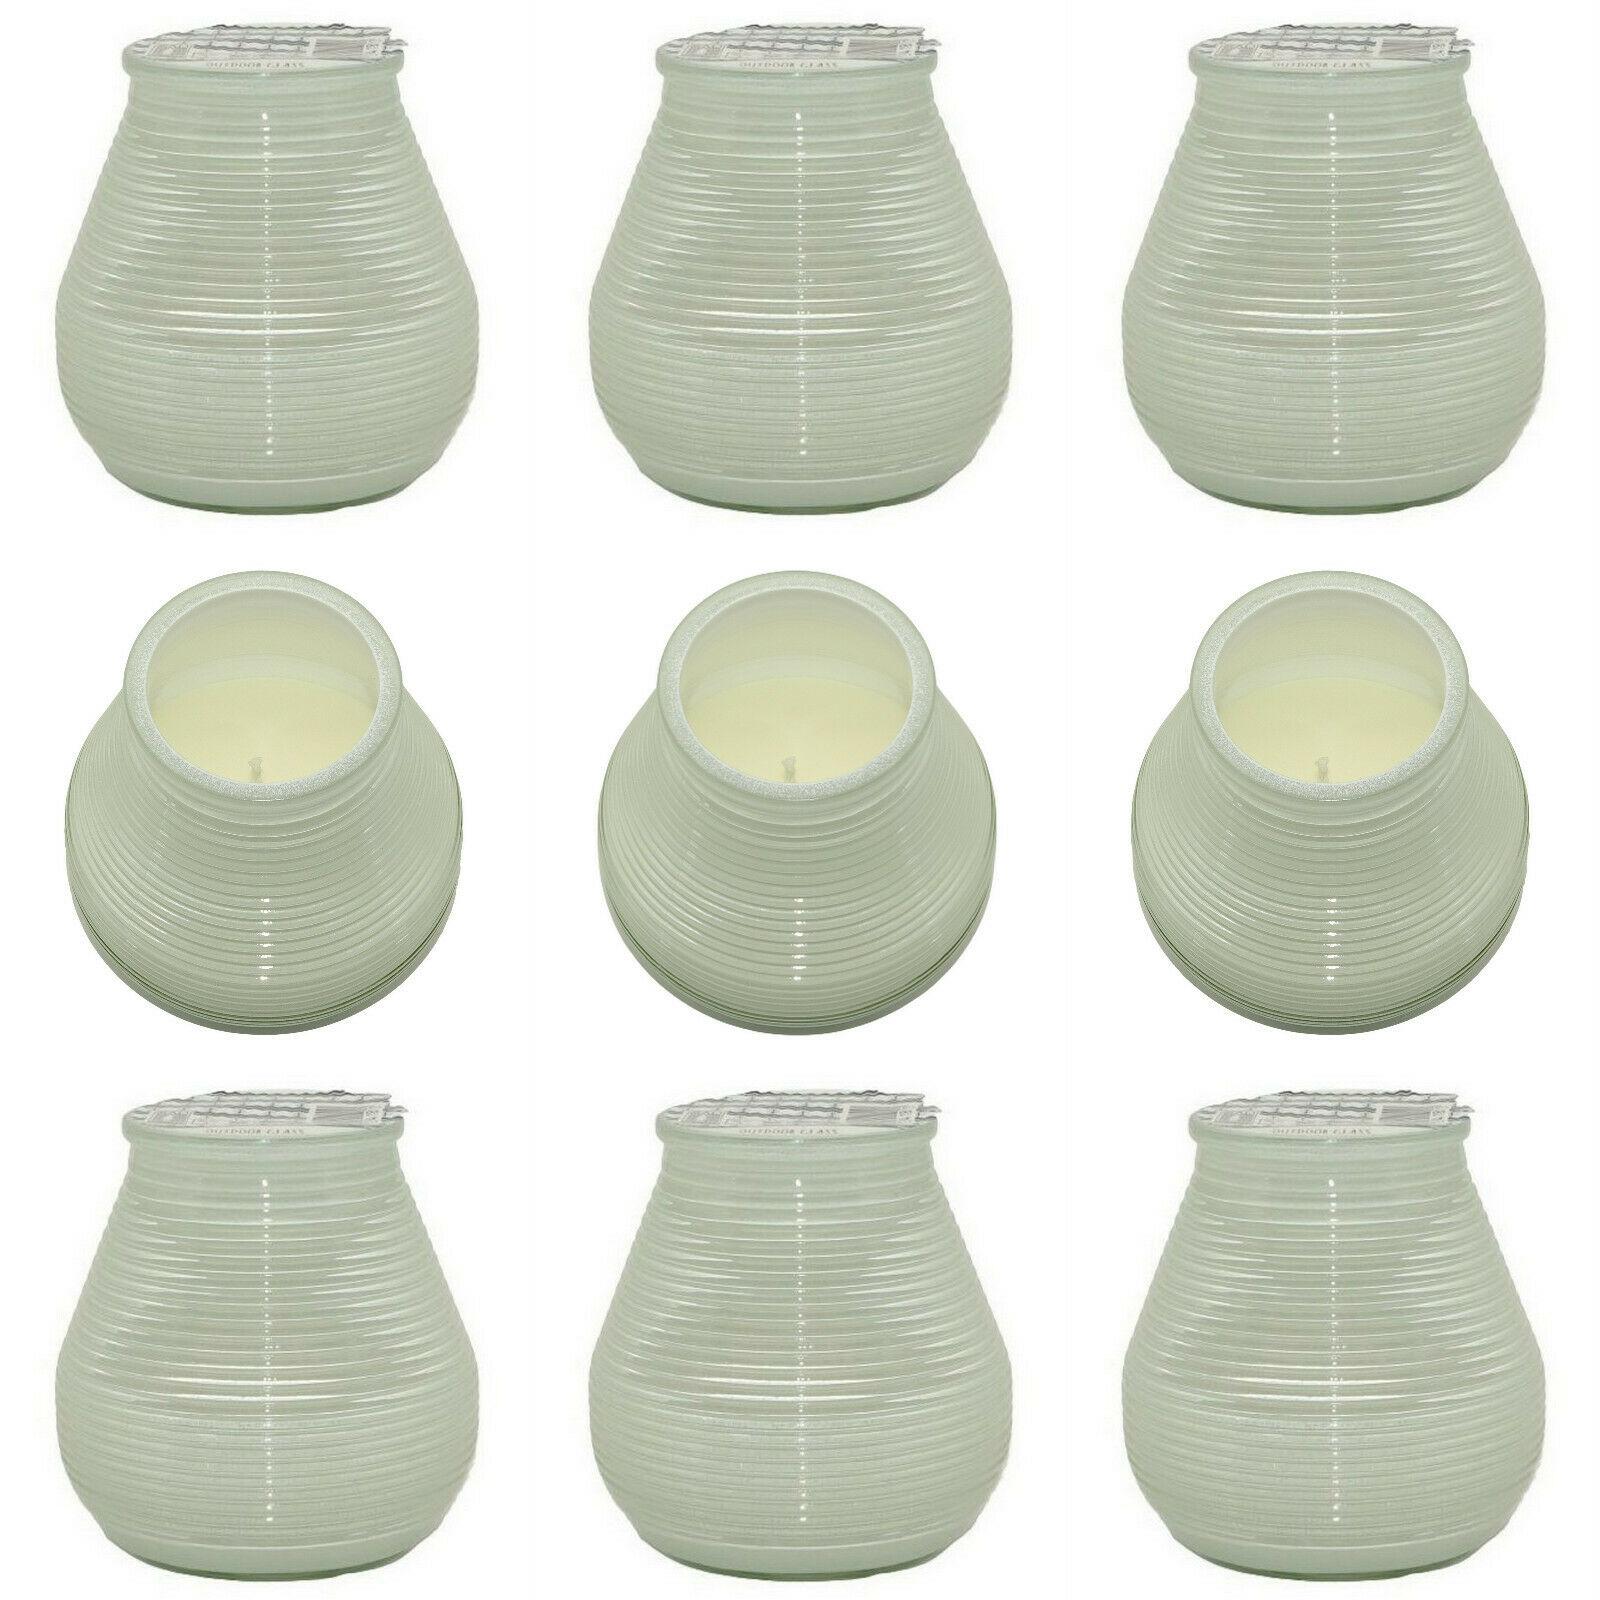 10 Stück Outdoor Kerzenglas 94x91mm Kerzen im Glas Garten Windlicht Kerze weiß